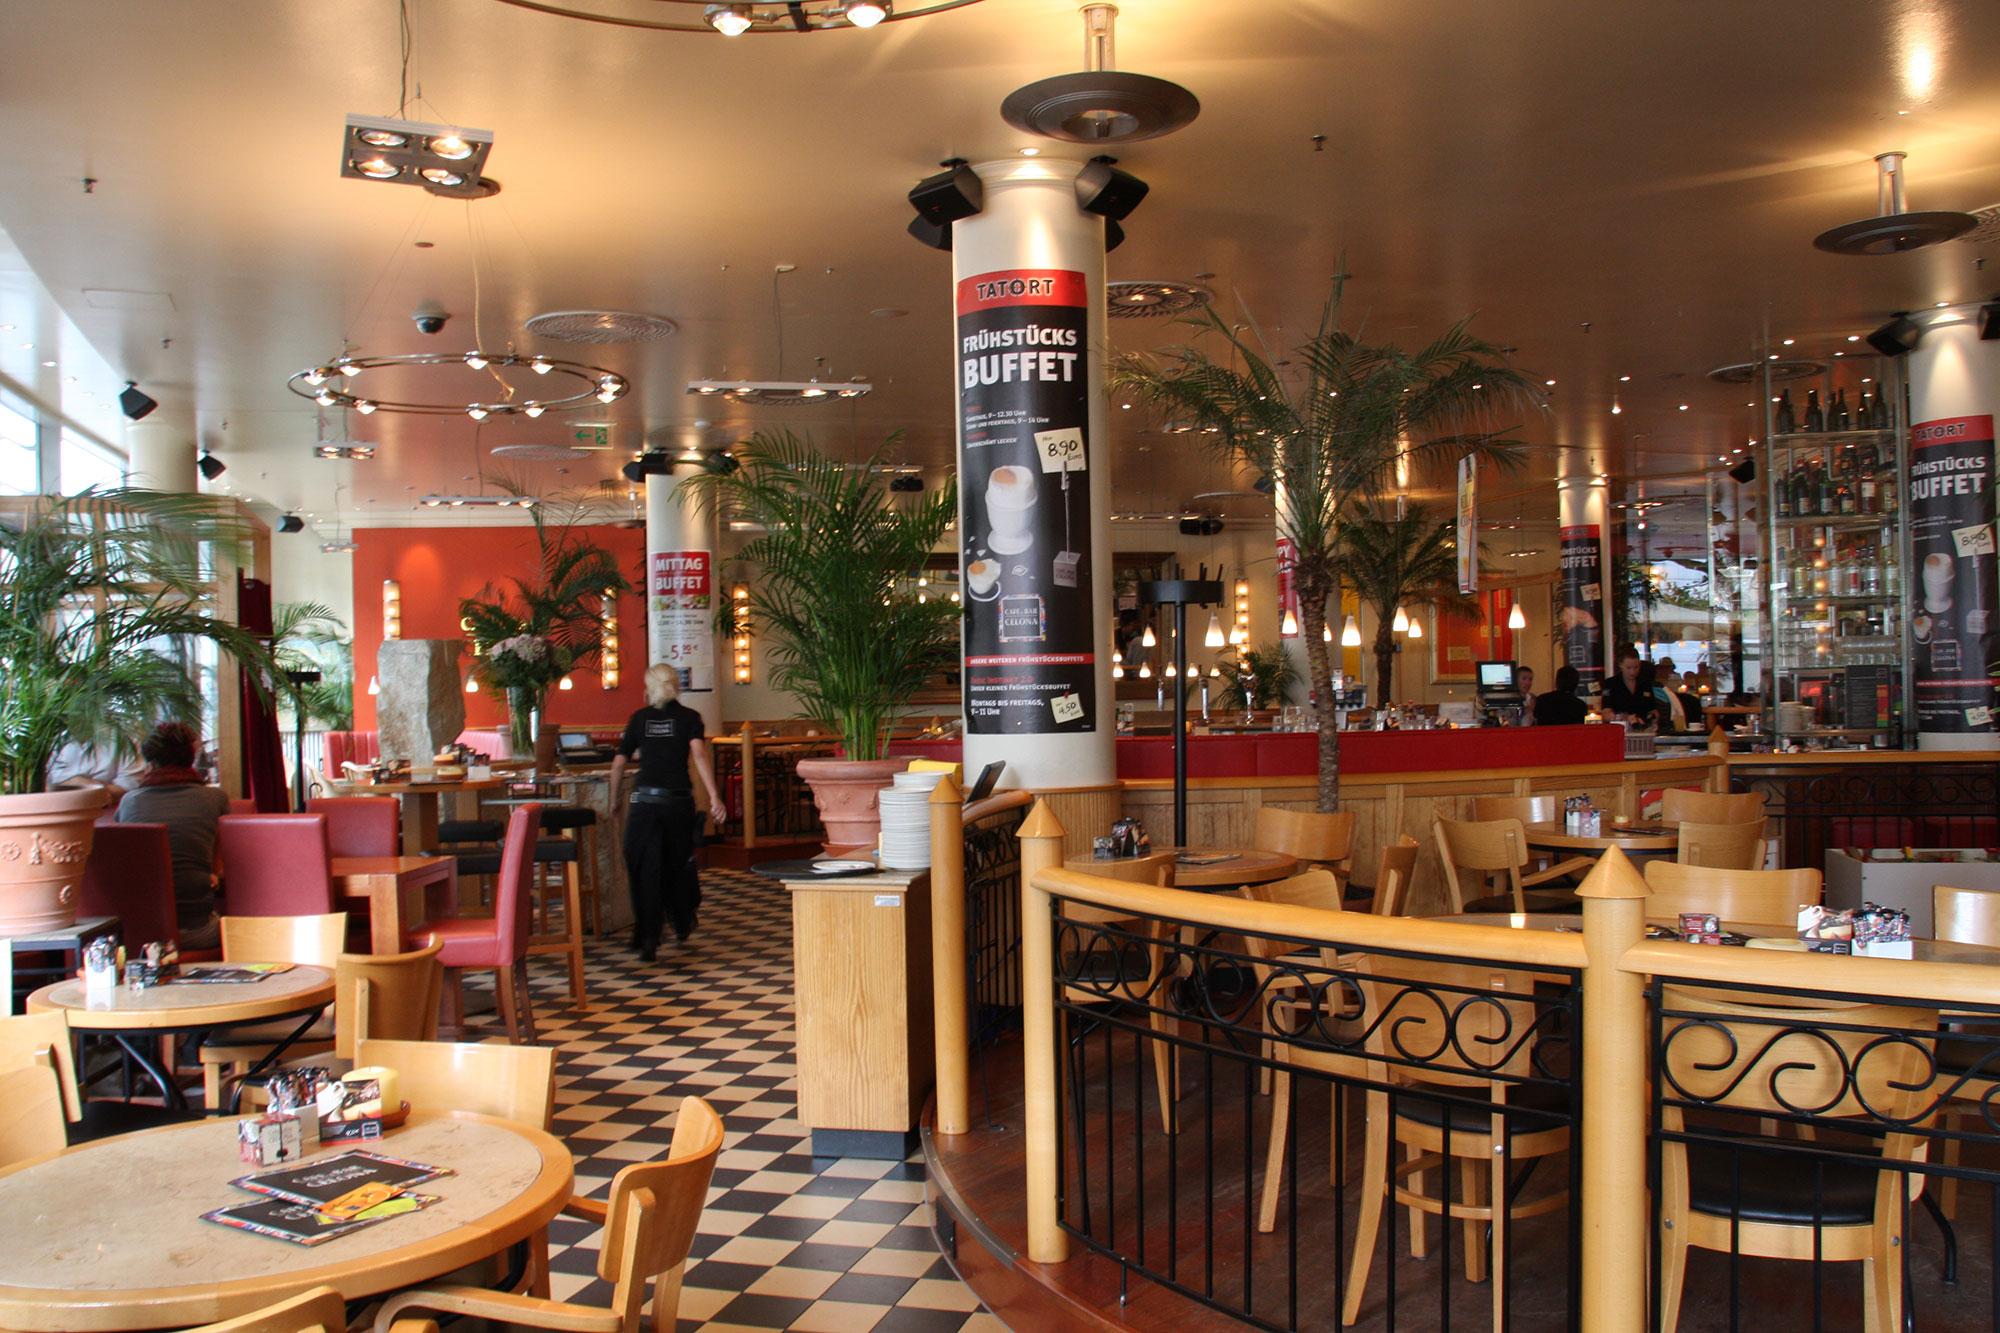 cafe & bar celona siegen - cafe & bar celona, Wohnzimmer